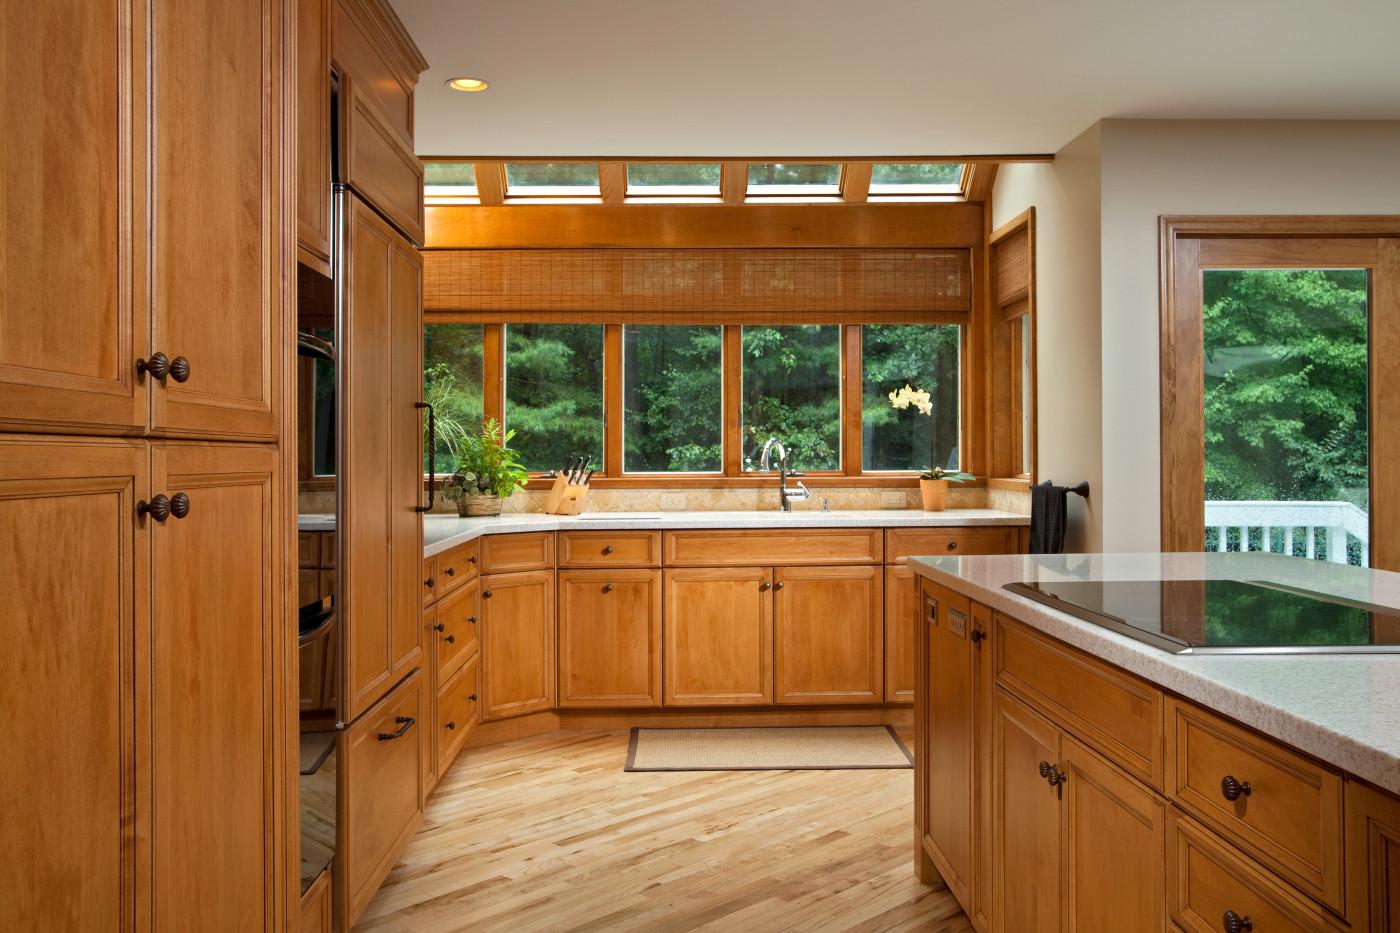 Luxury Kitchen Design With Skylights Teakwood Builders